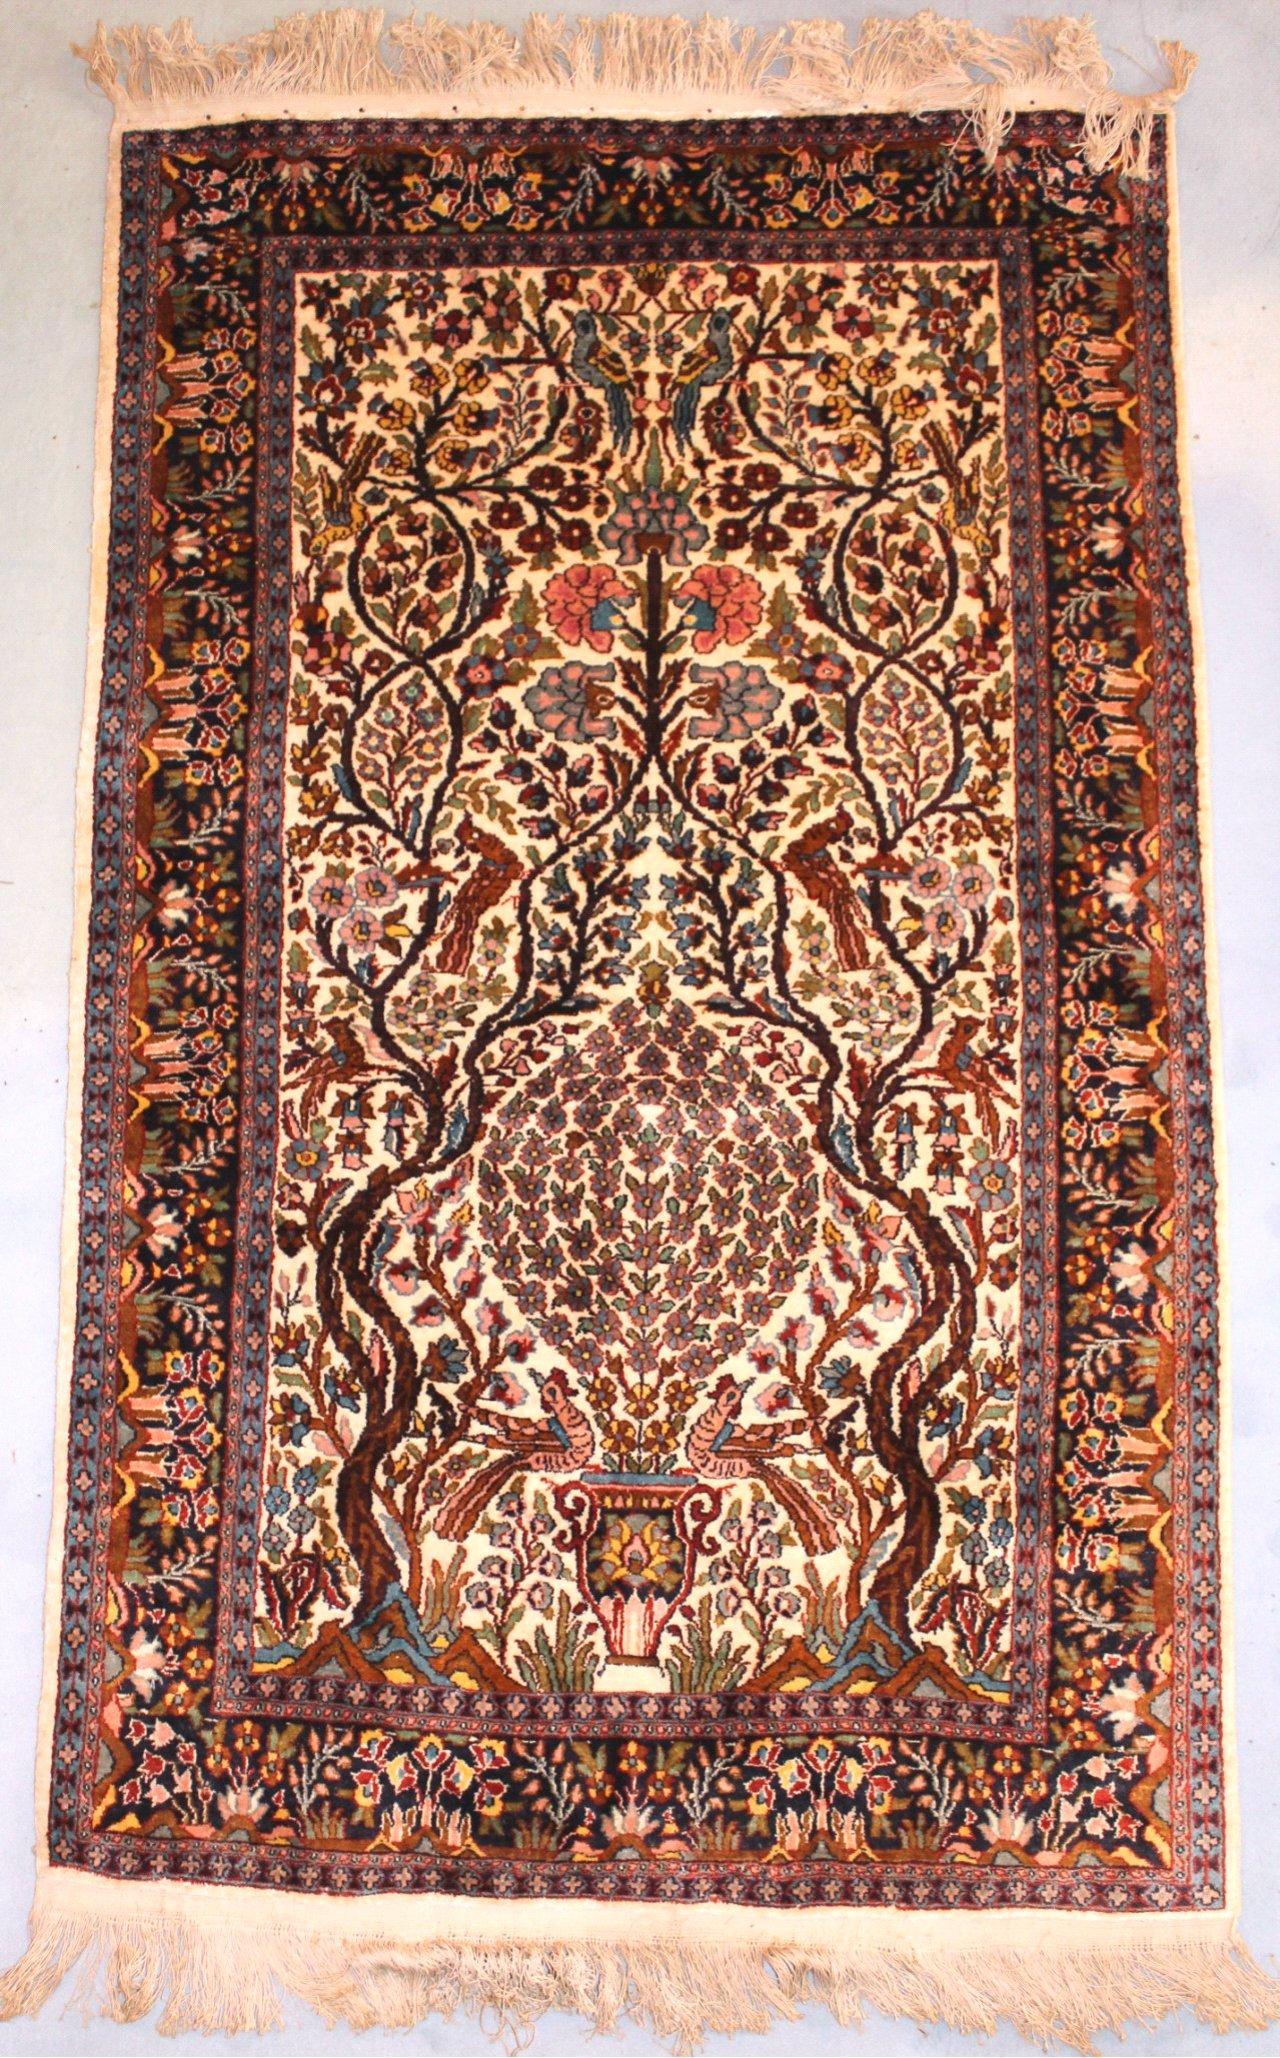 Seiden-Teppich